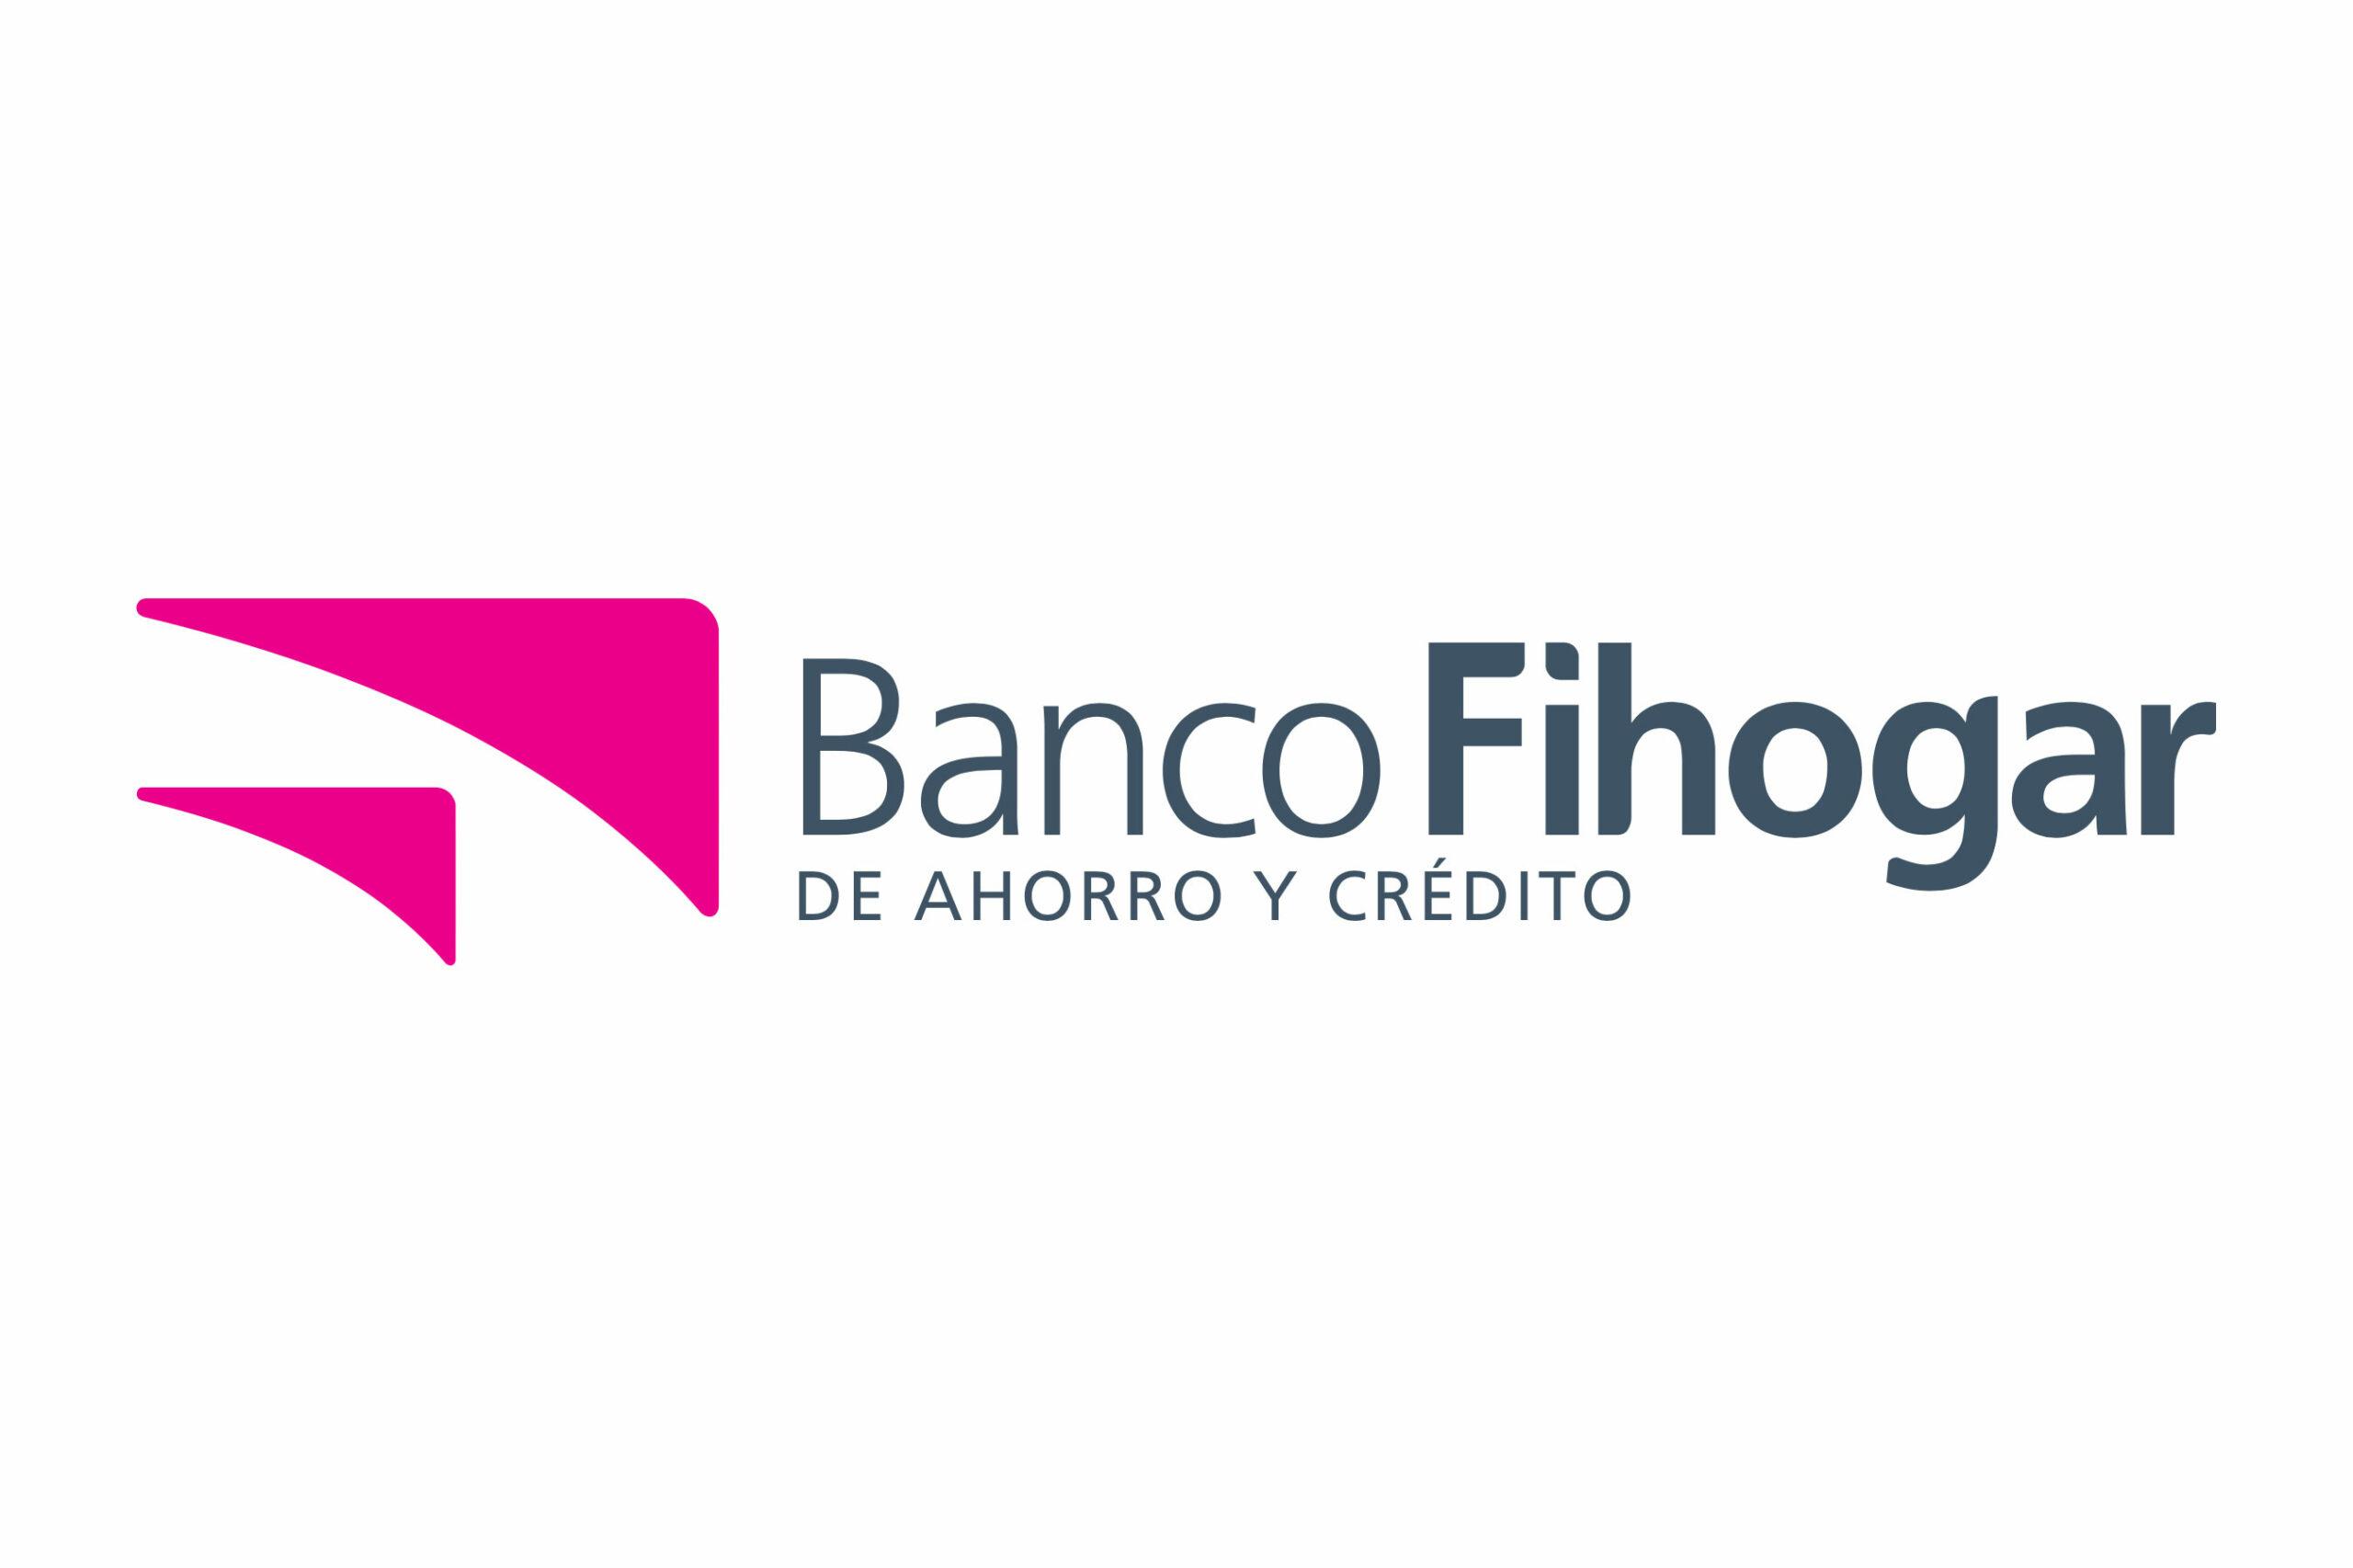 Integración Banco Fihogar a Mi Punto - image integración-banco-fihogar-a-mi-punto-scaled-1 on https://gcs-international.com